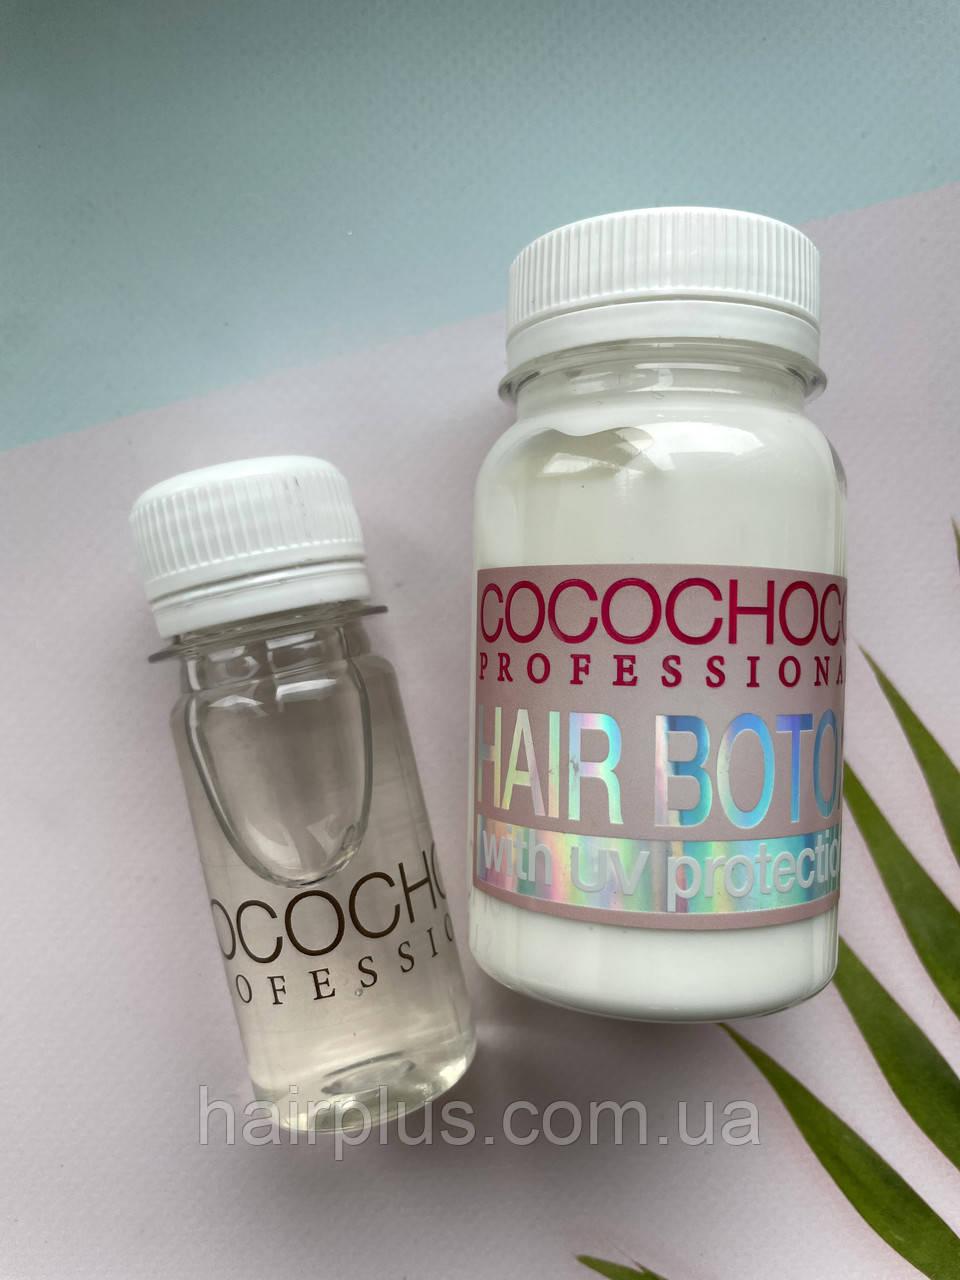 Hair botox для волос 100 мл + 40 мл шампуня